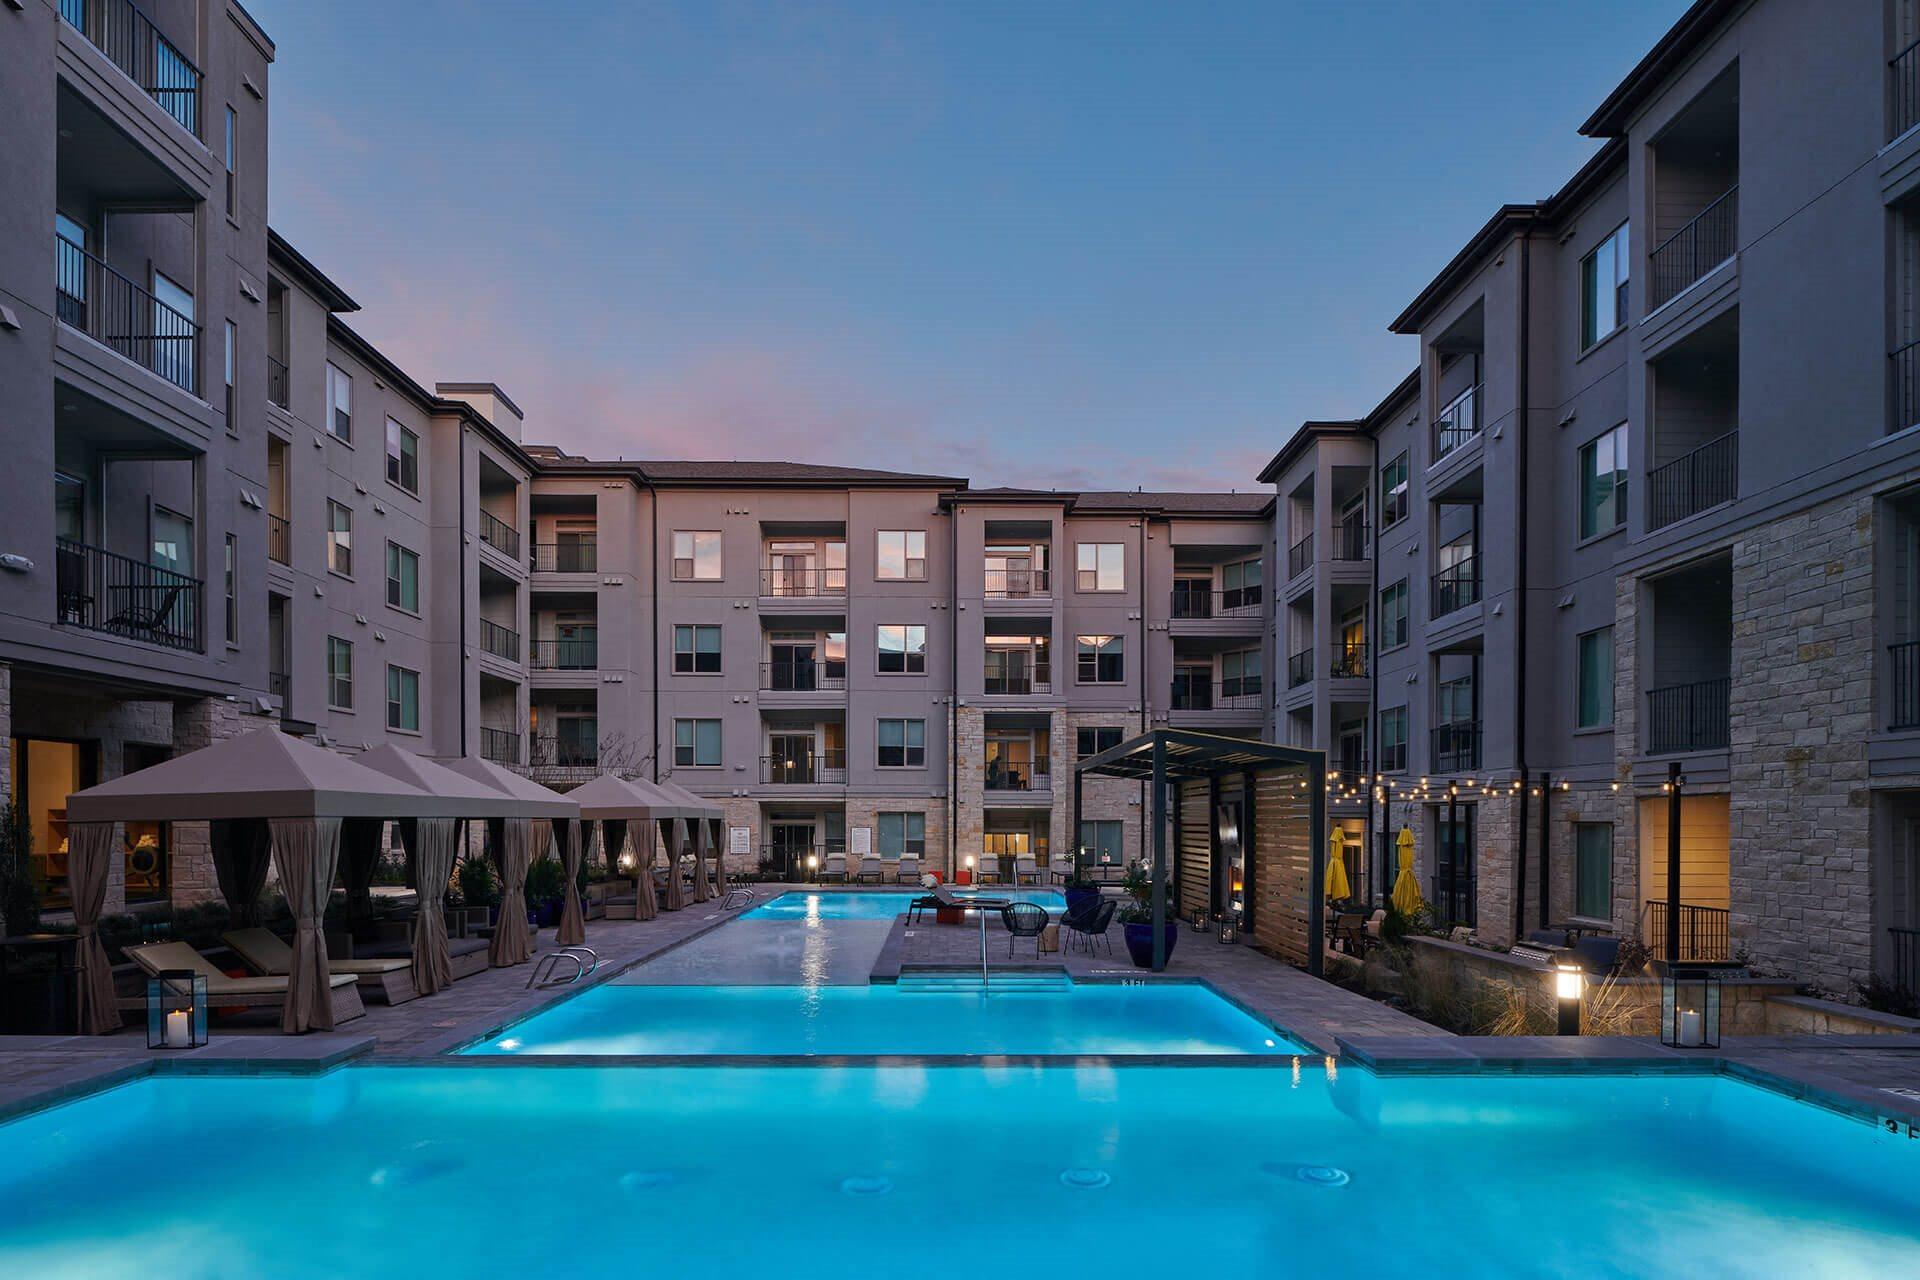 Luxury Apartments Available at Windsor Burnet, 10301 Burnet Rd, Austin